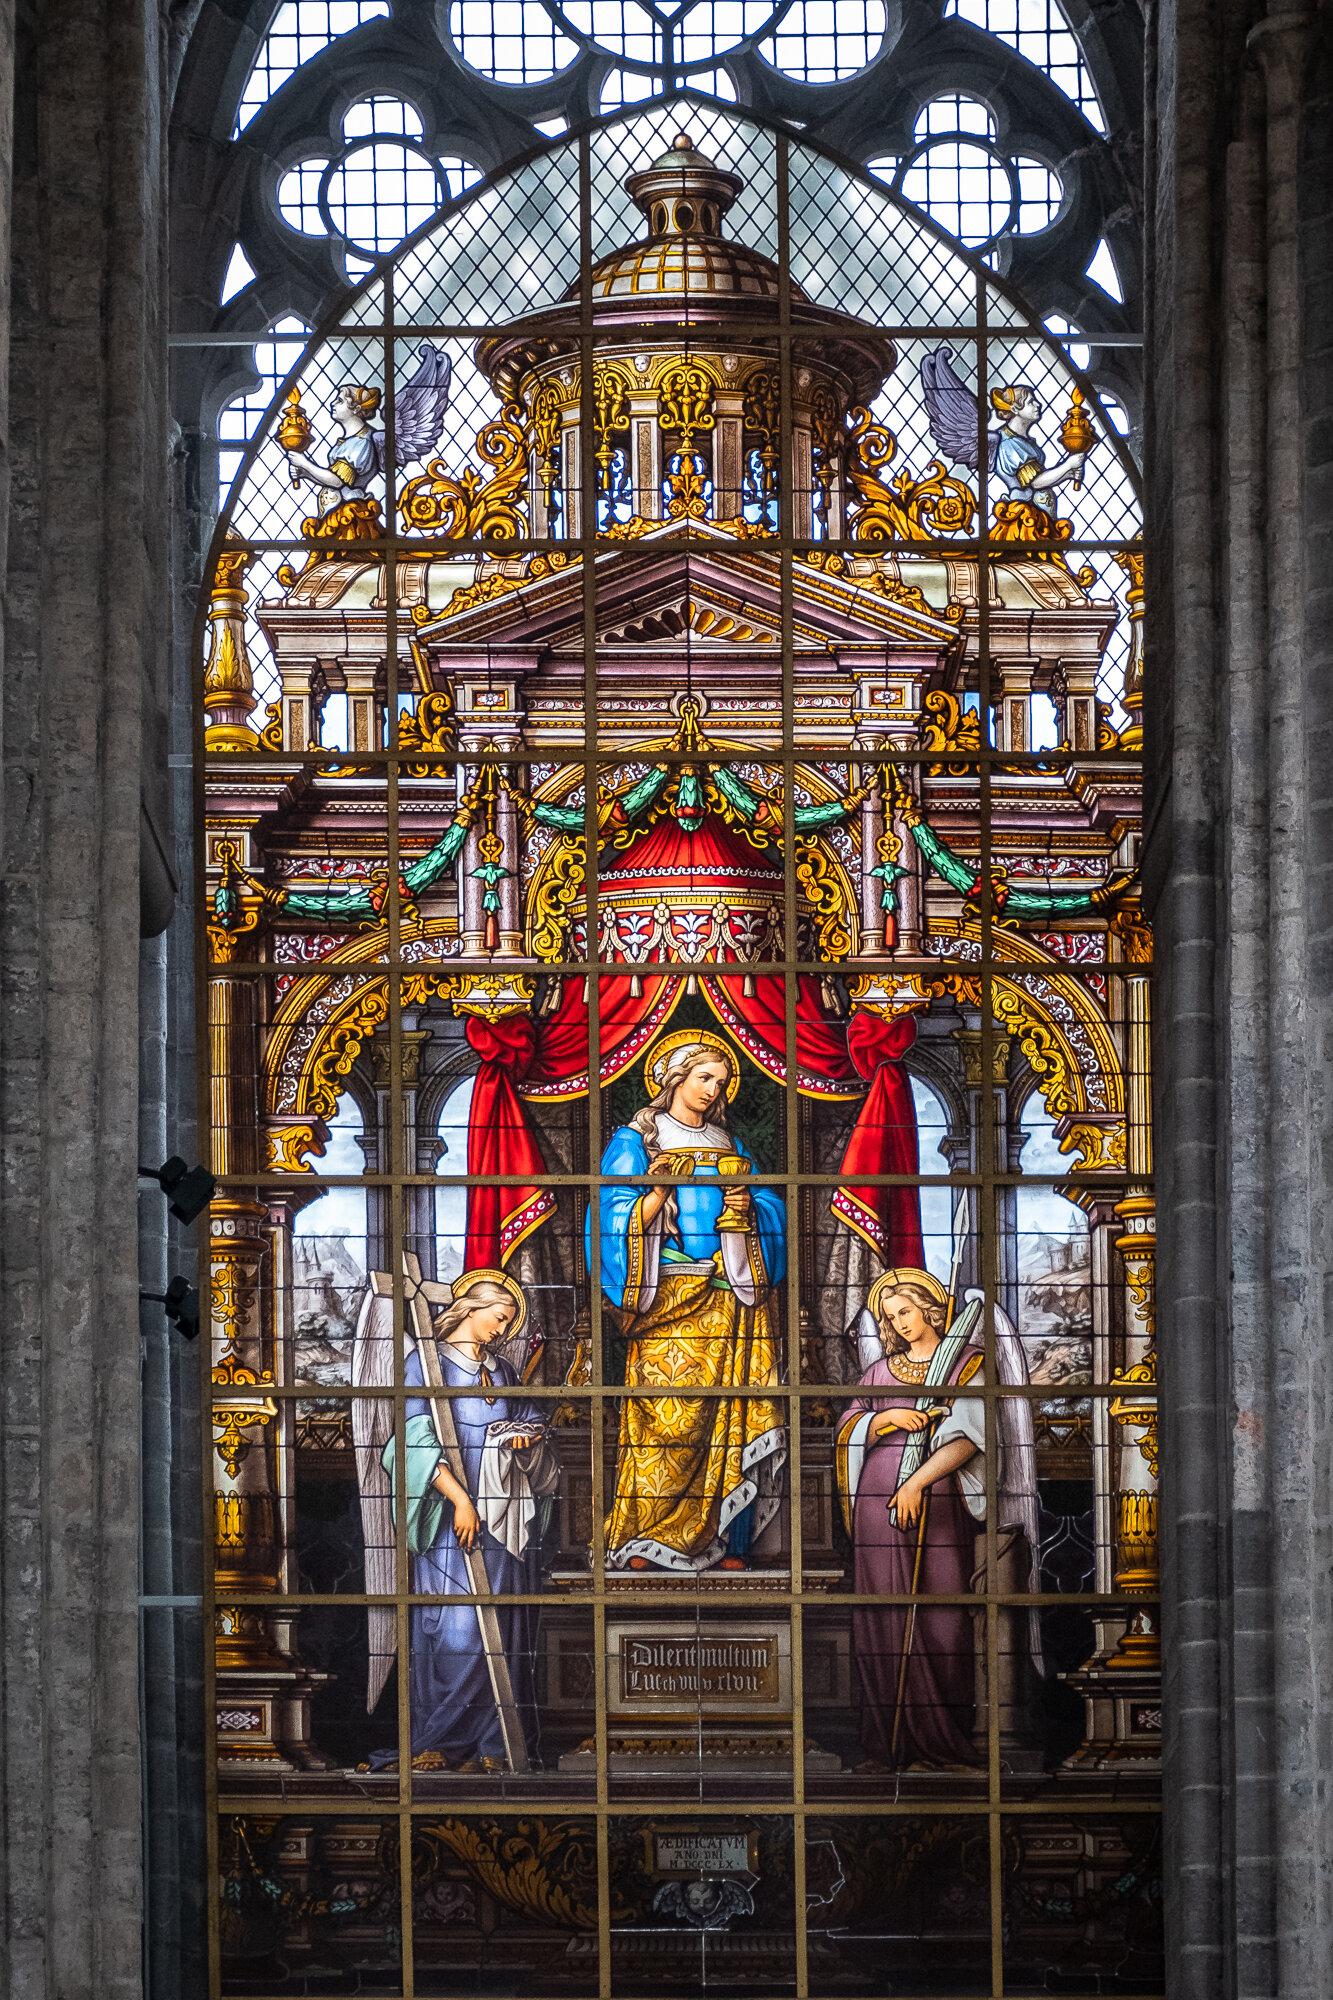 A stained glass window inside St. Nicholas' Church